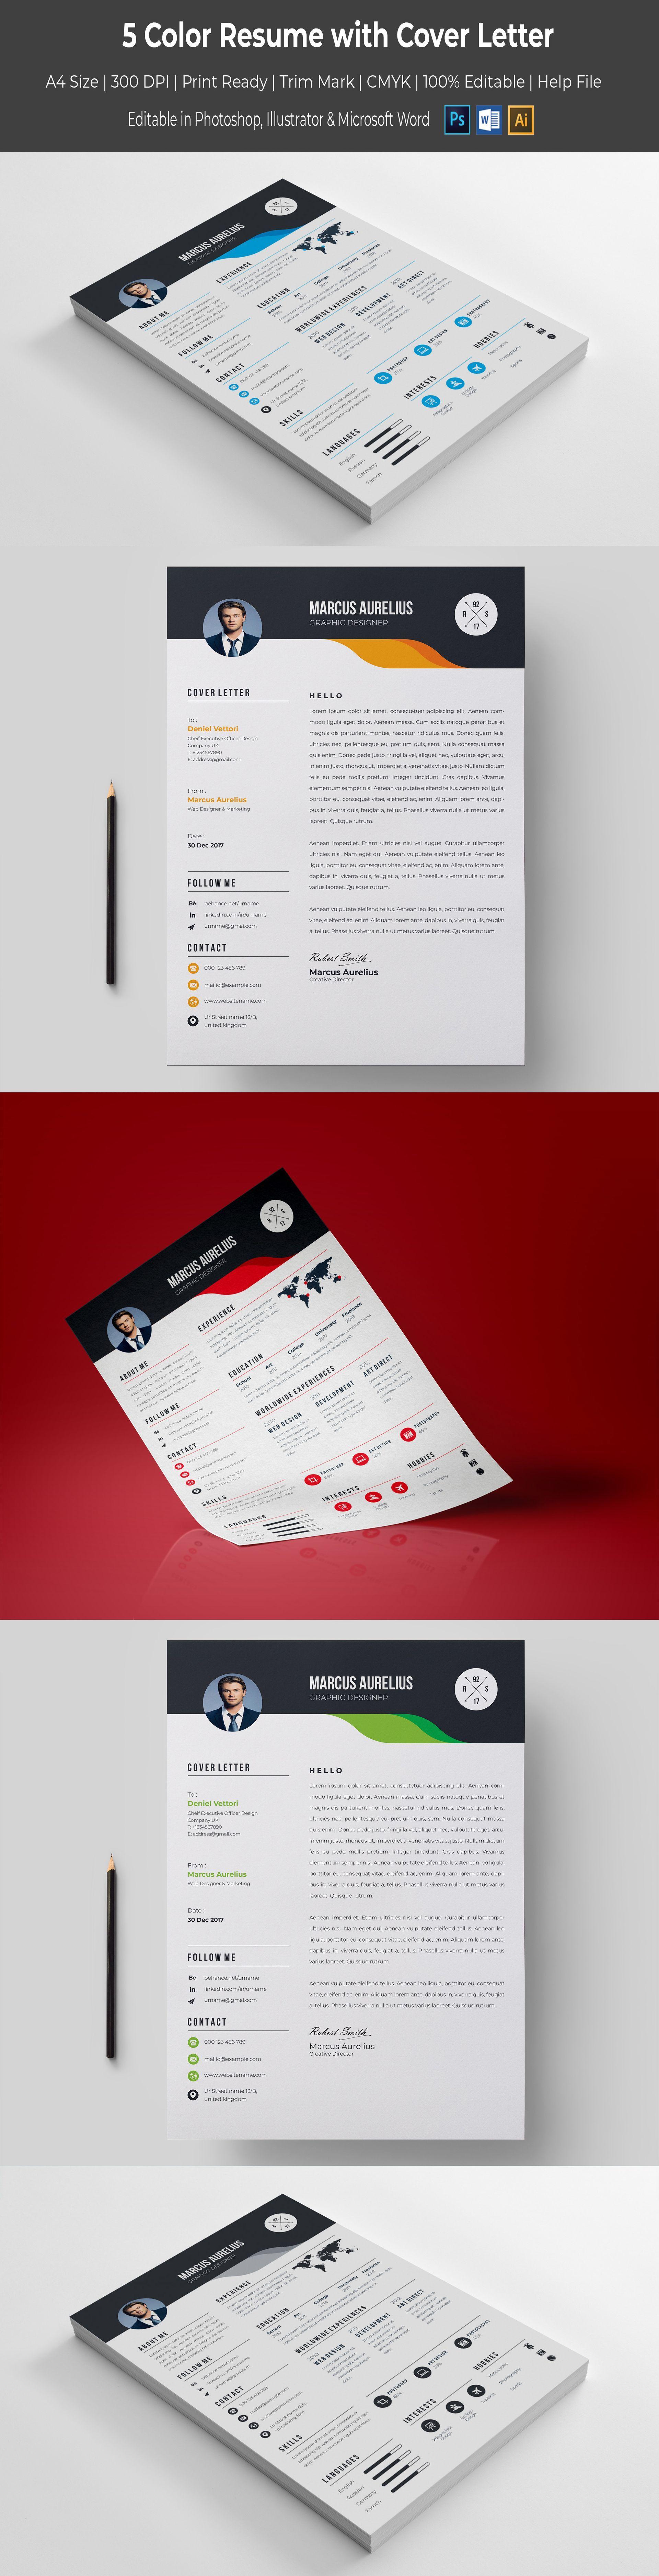 5 color resume template 67450 resume template job